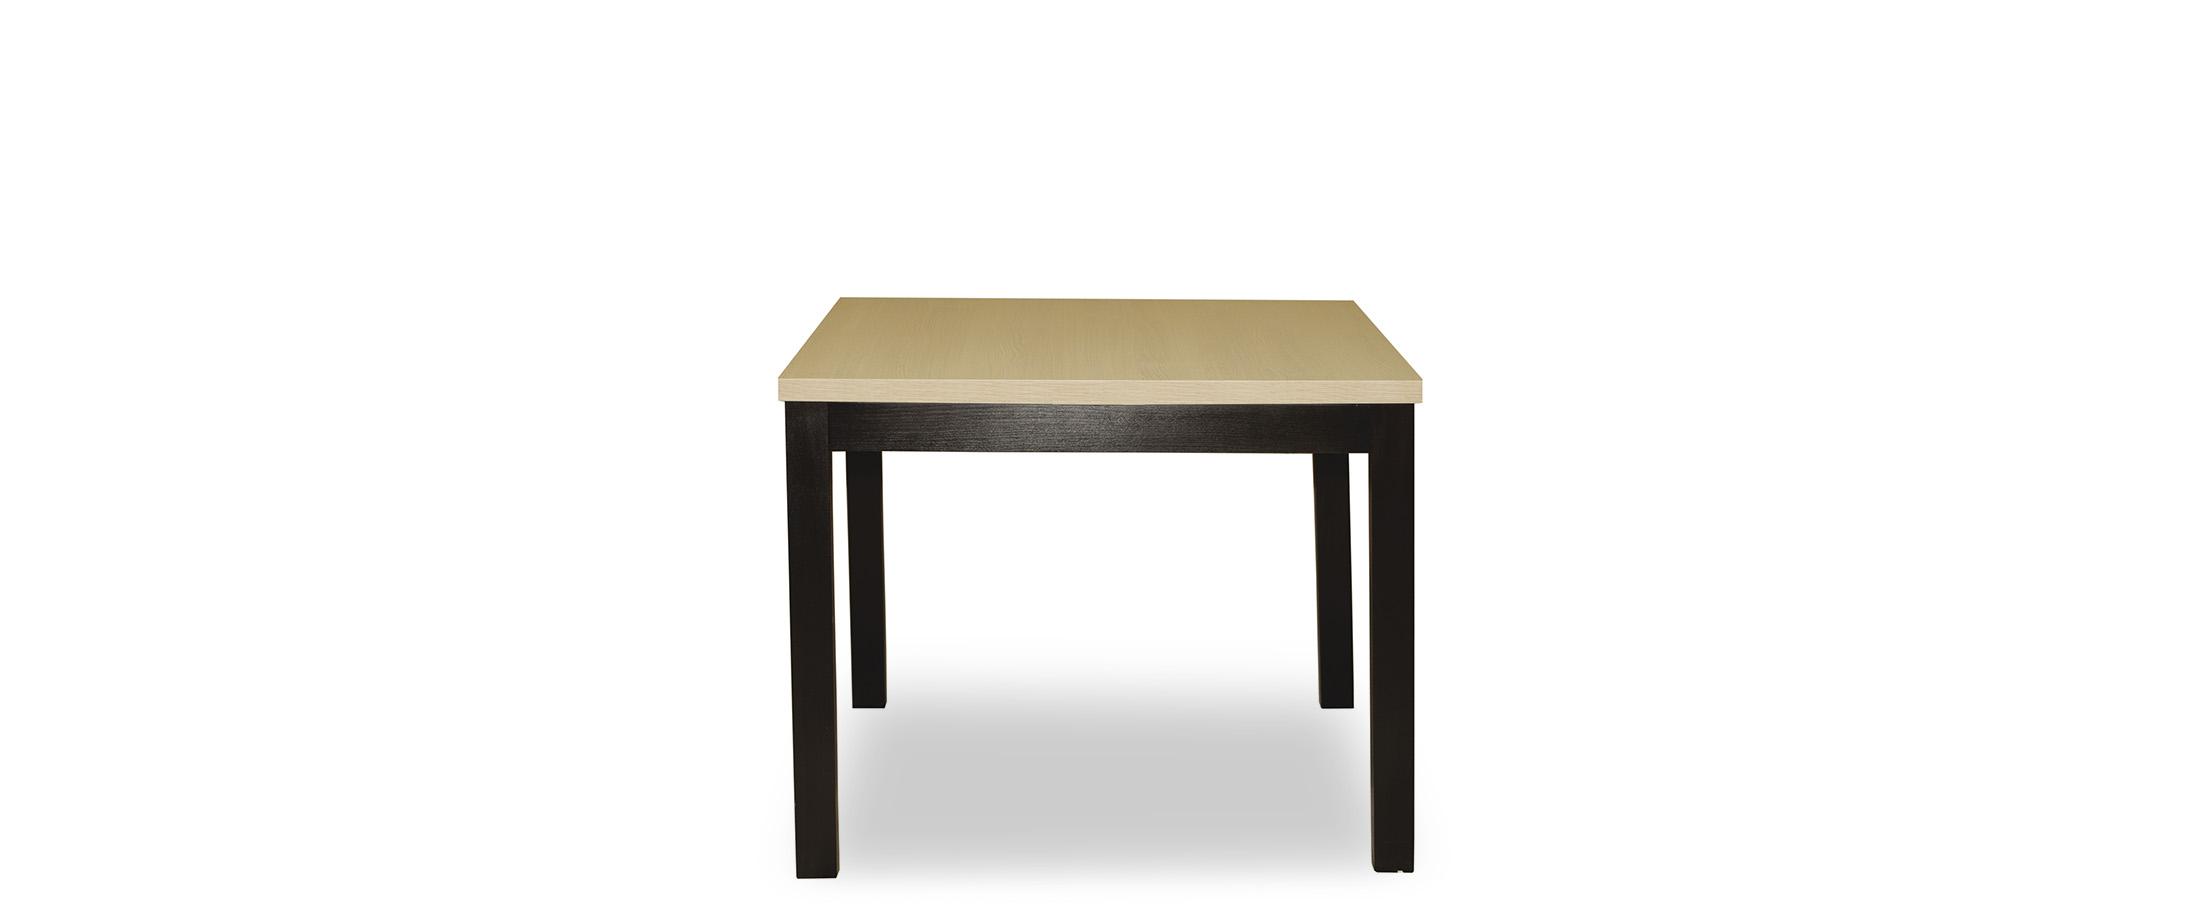 Стол Фиоре 4 Модель 370